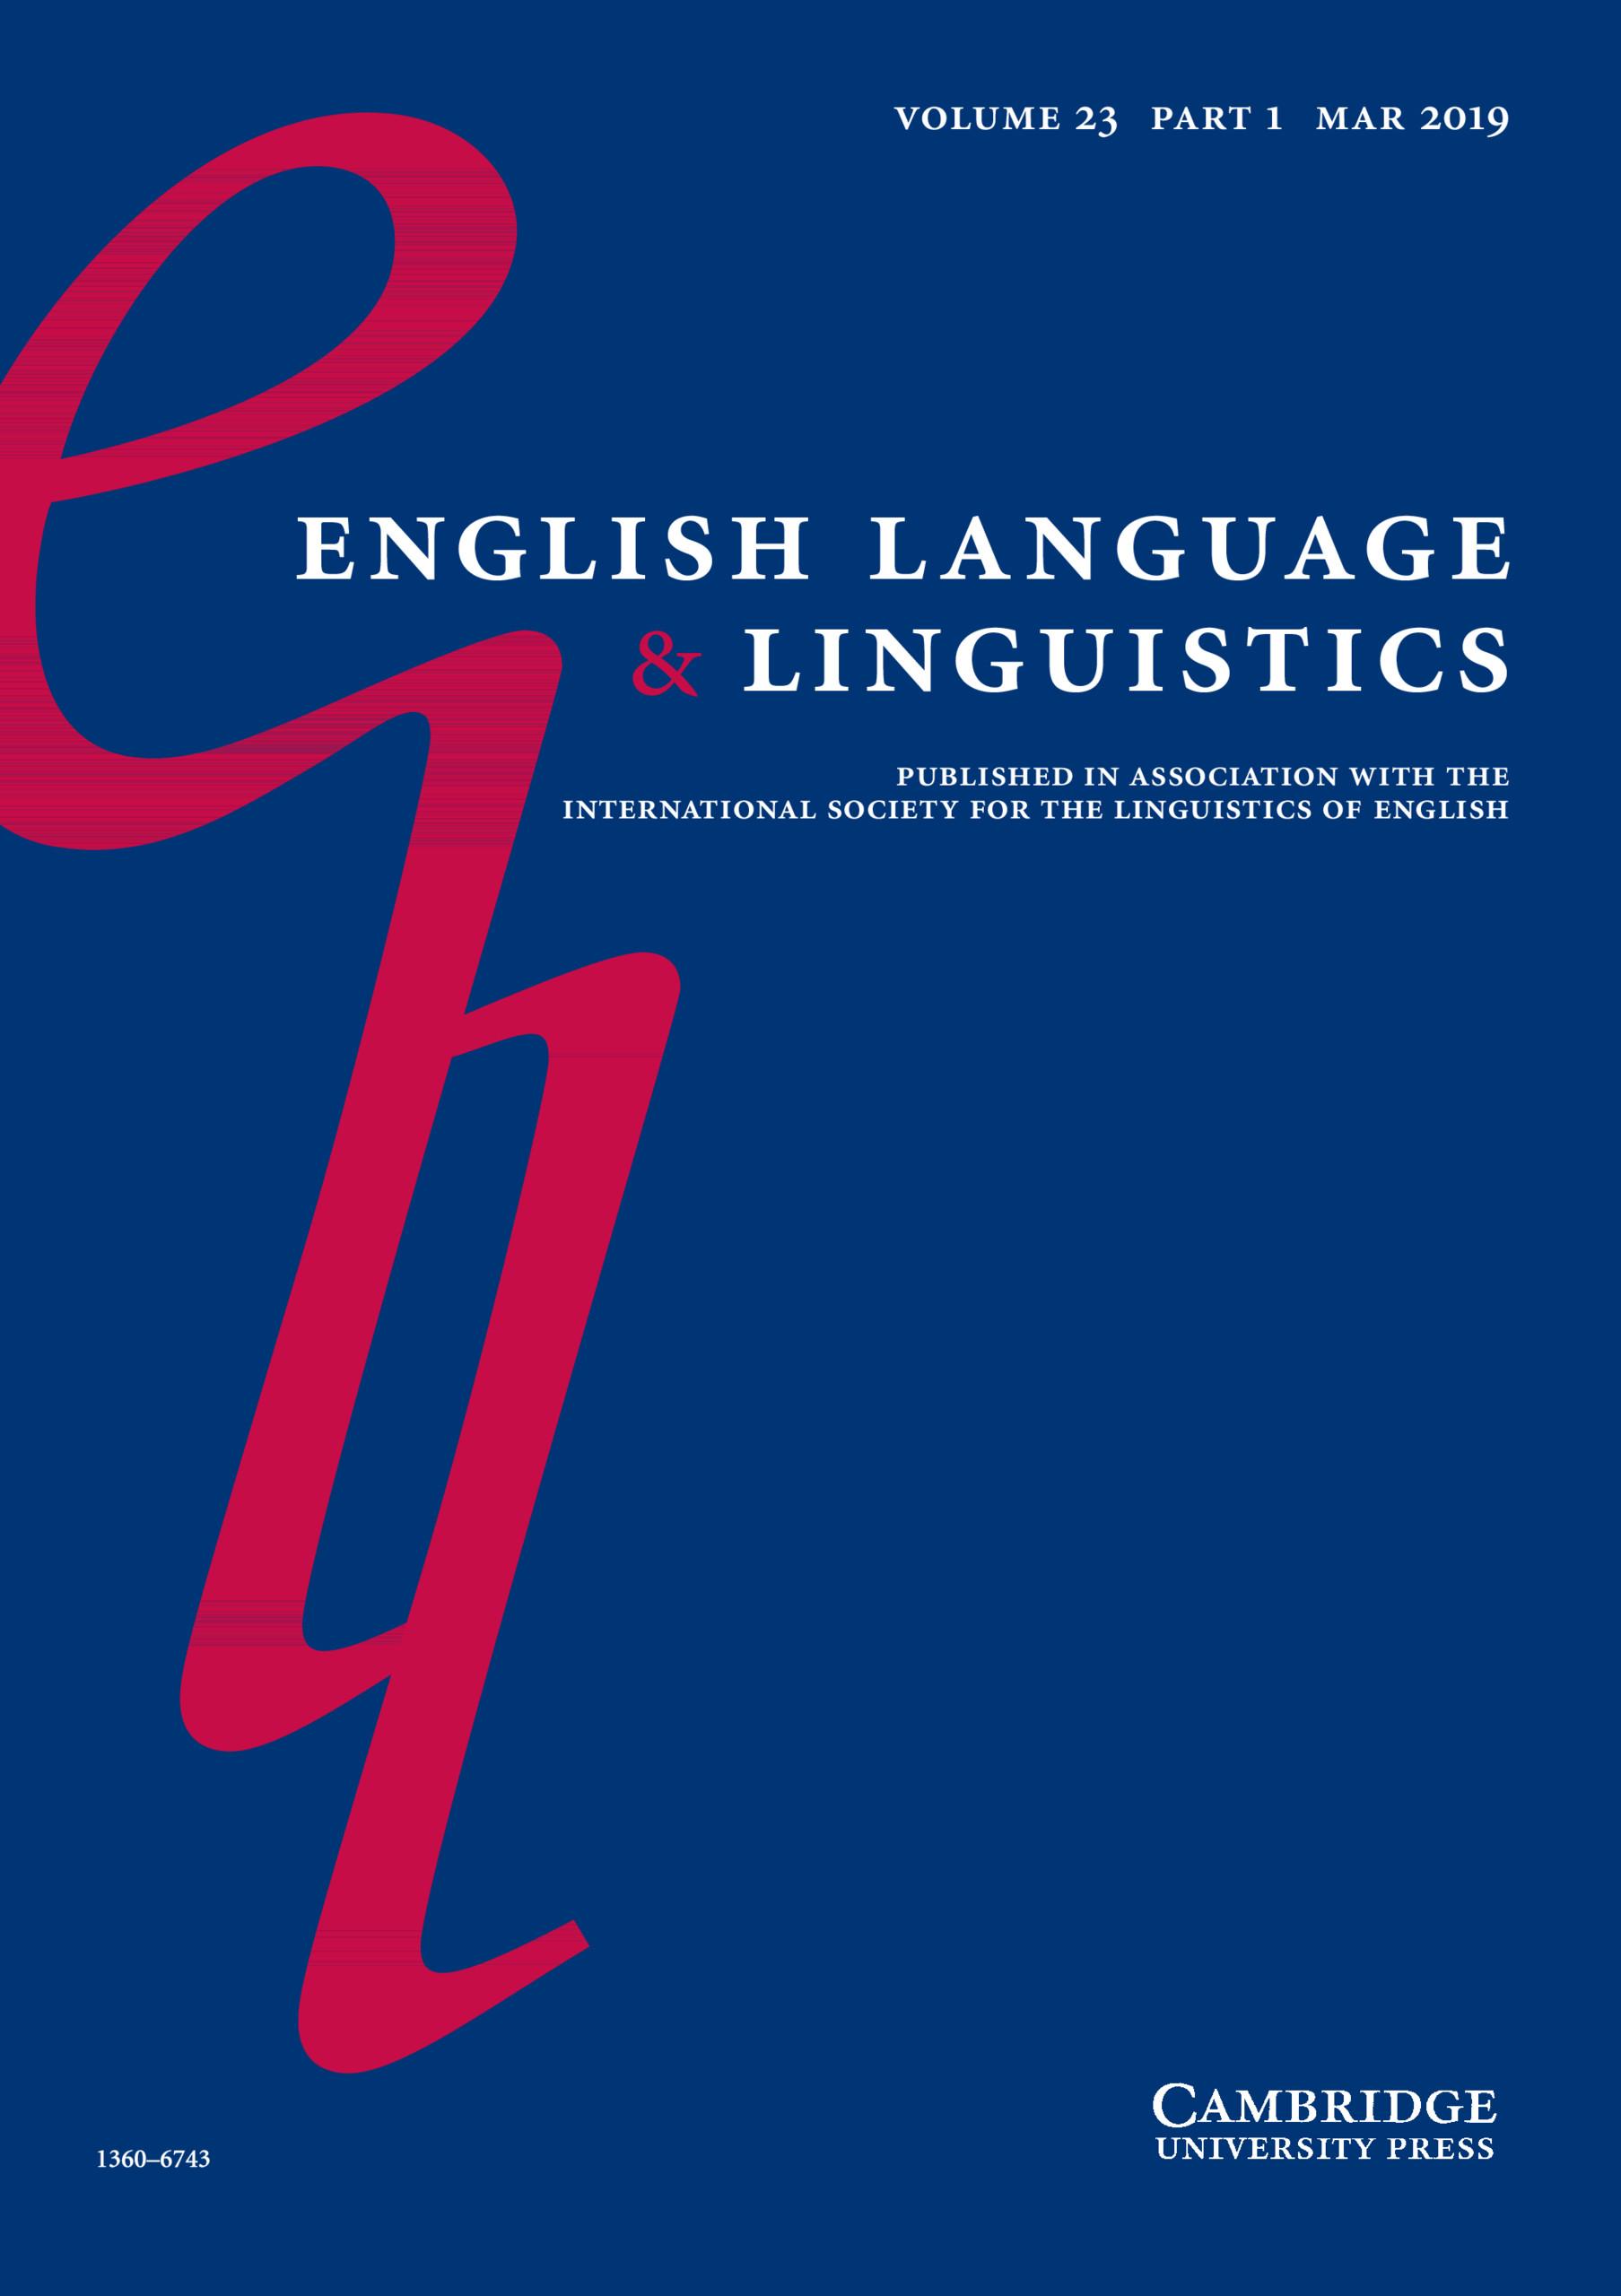 Cover photo of English Language & Linguistics 23.1